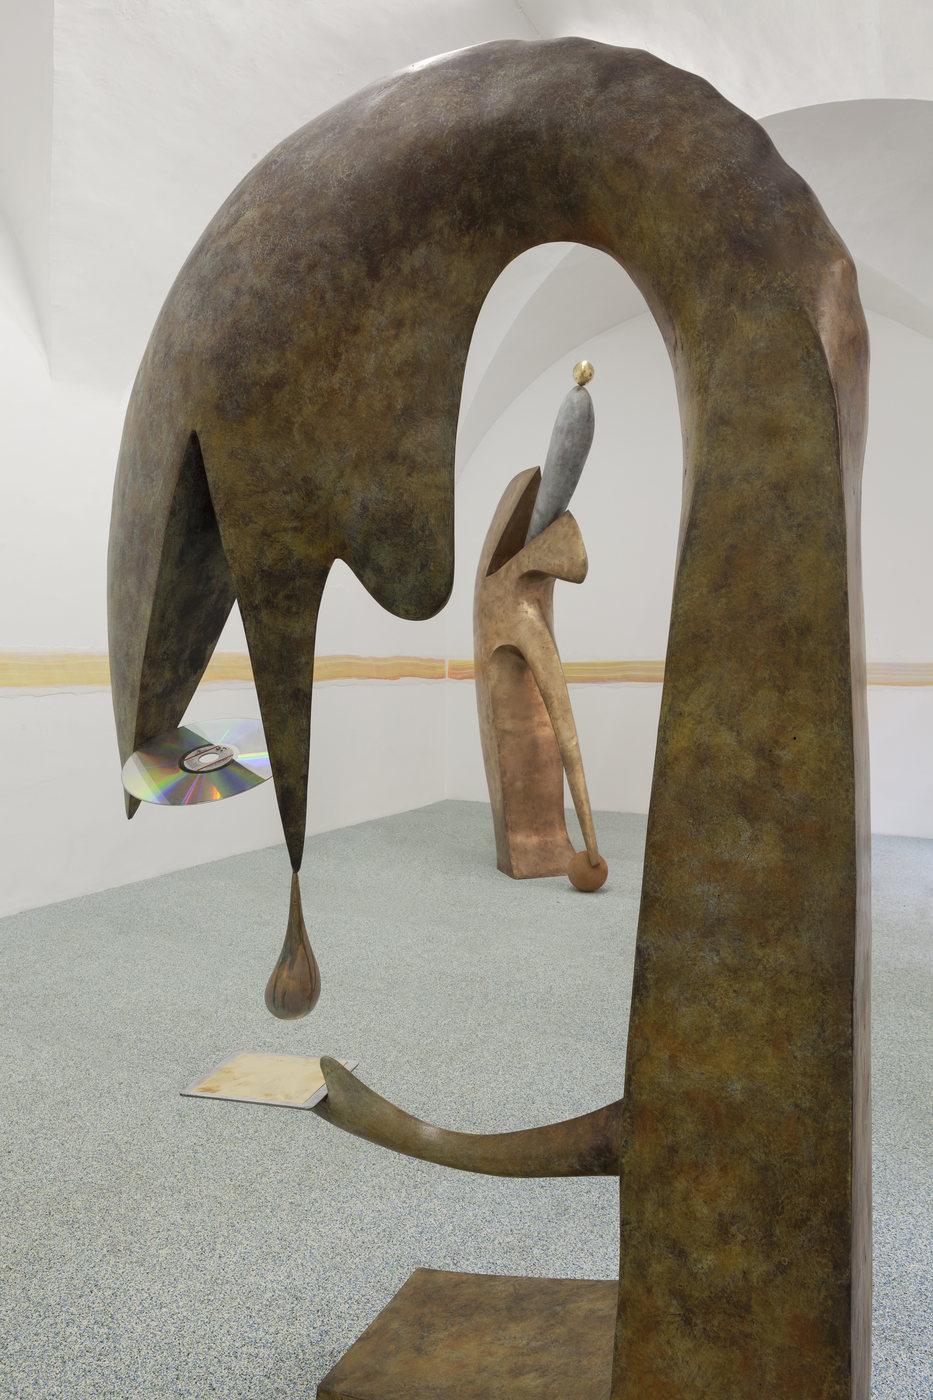 29. Camille Henrot, Monday. Installation view, Fondazione Memmo, Rome, 2016